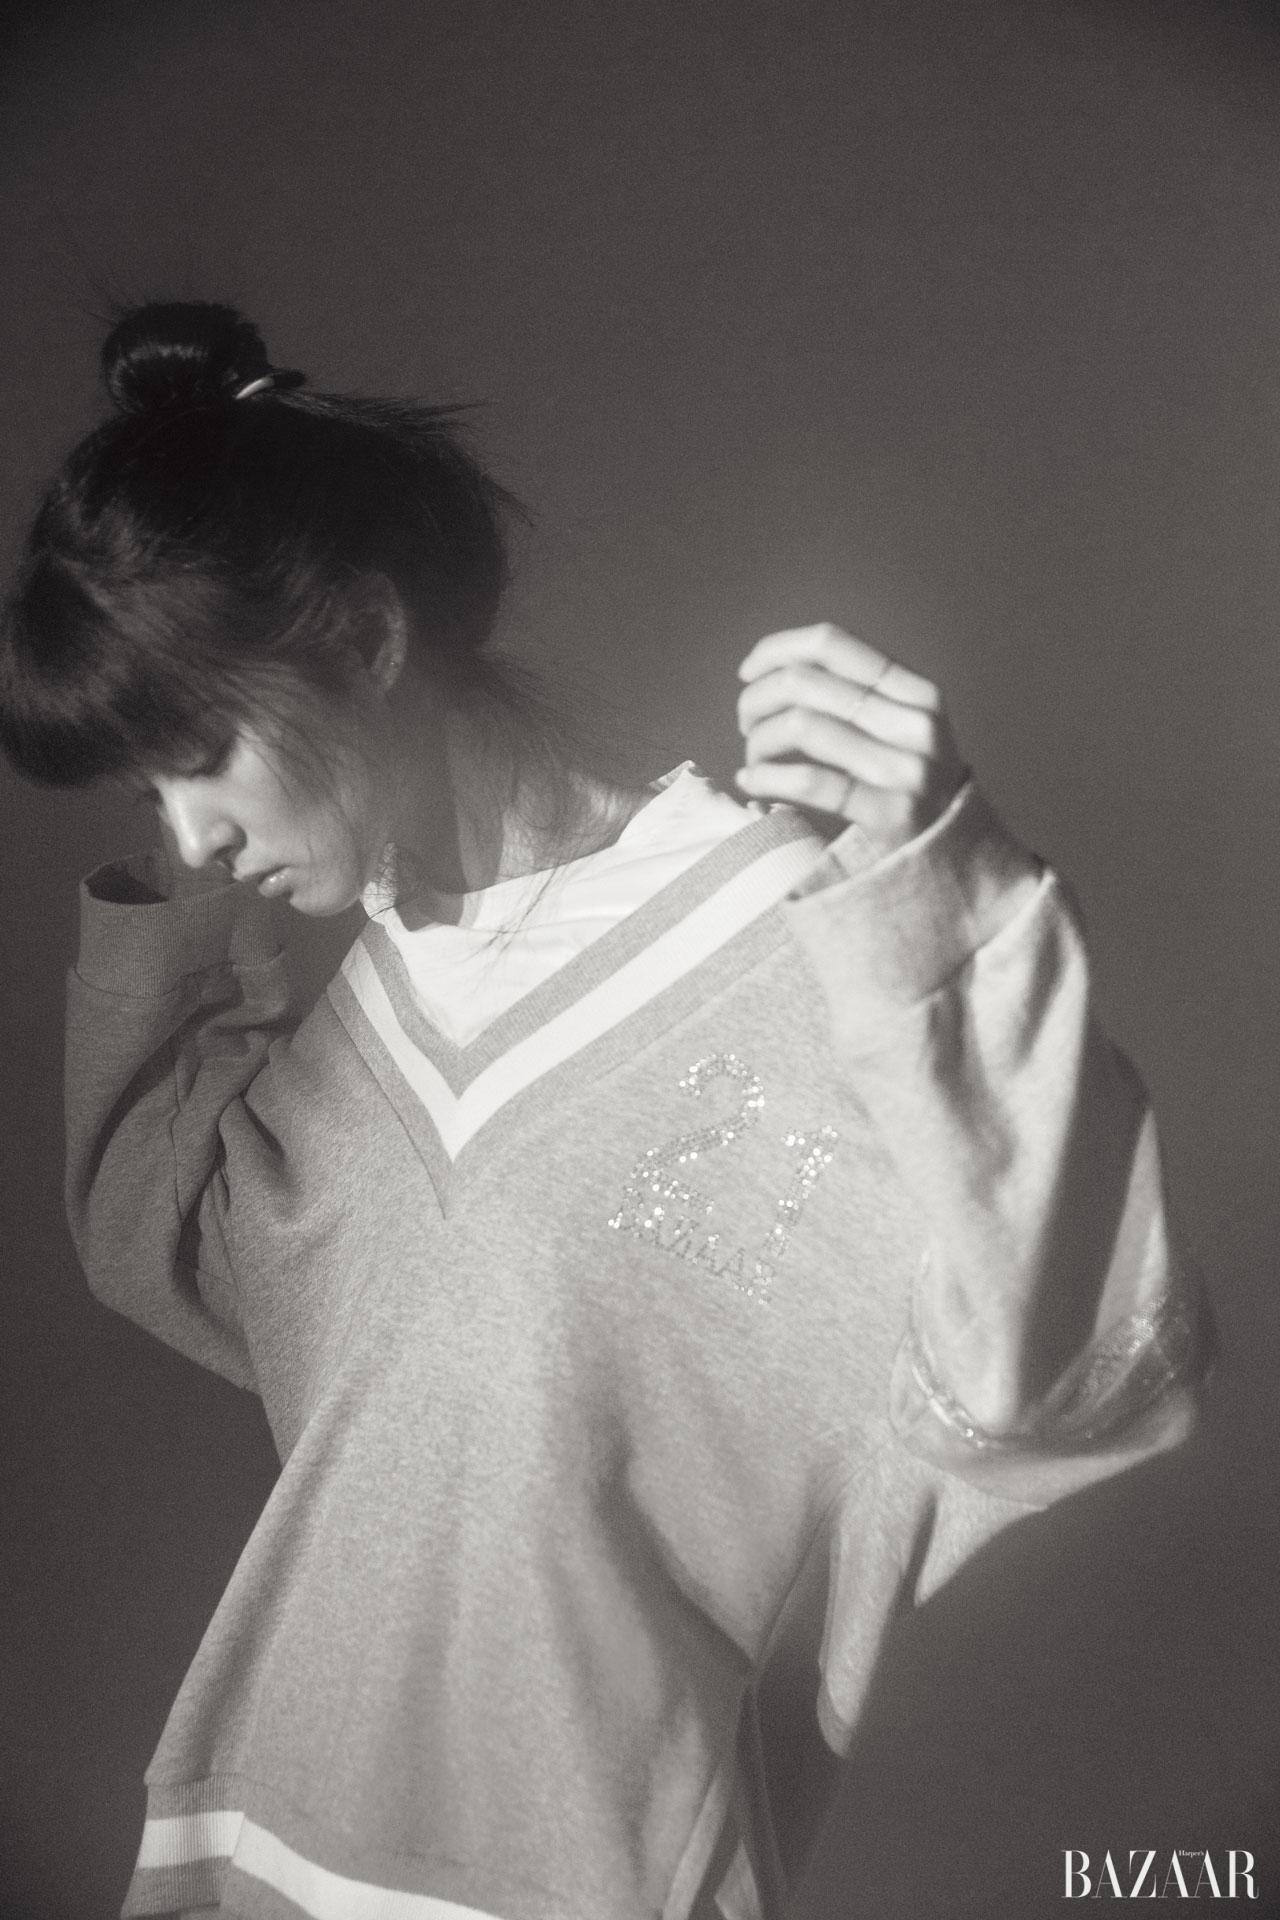 V넥 스웨트셔츠를 레이어드한 듯한 디자인의 티셔츠는 JINTEOK 제품.